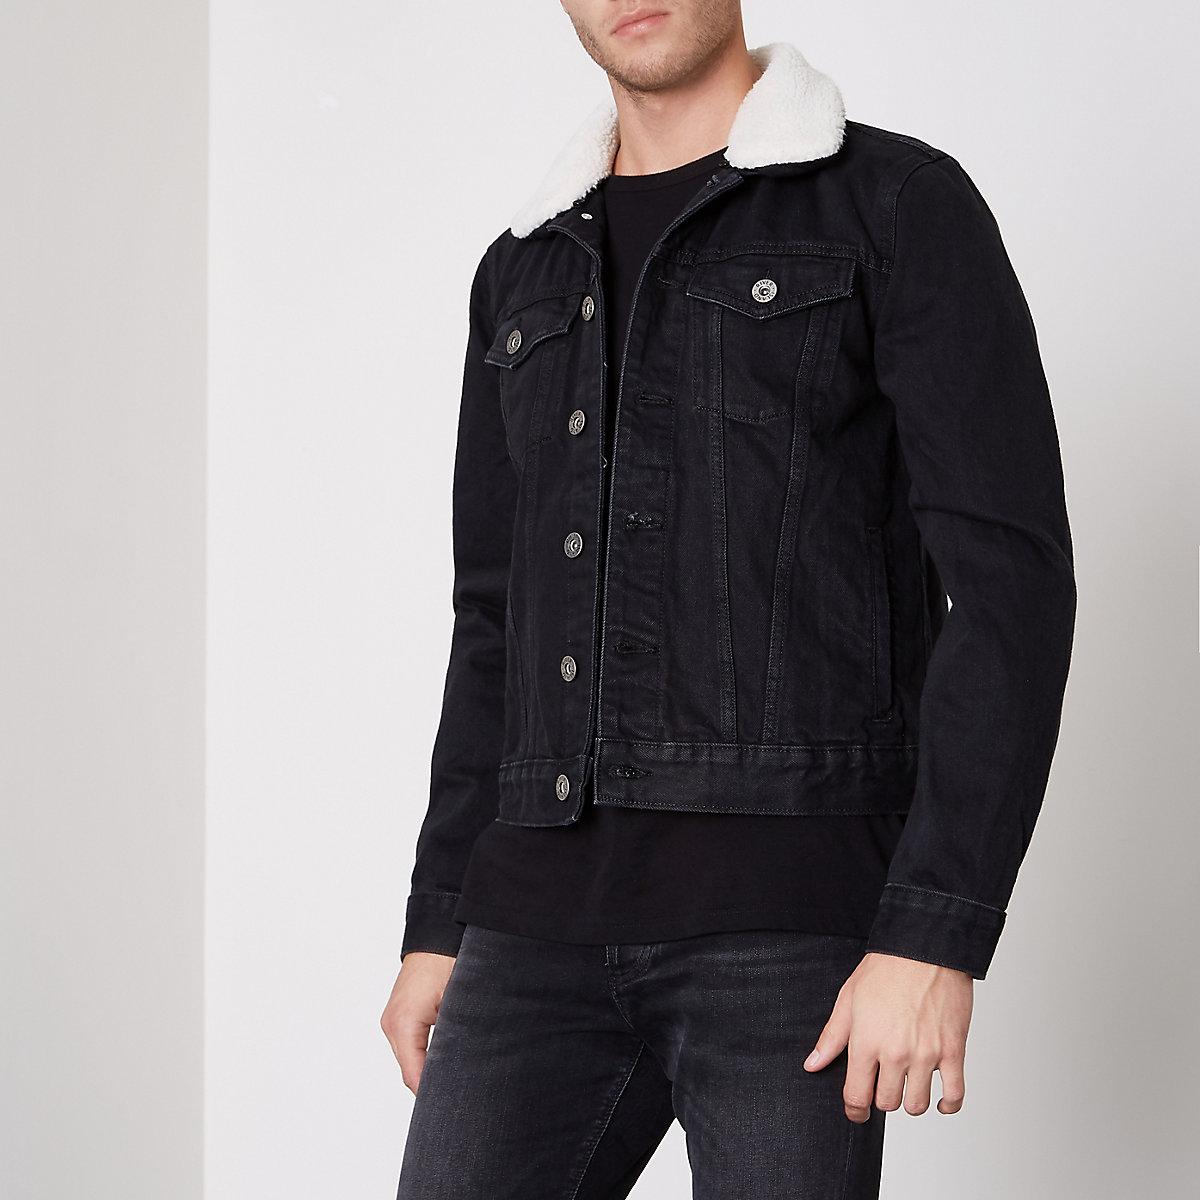 Black fleece lined denim jacket